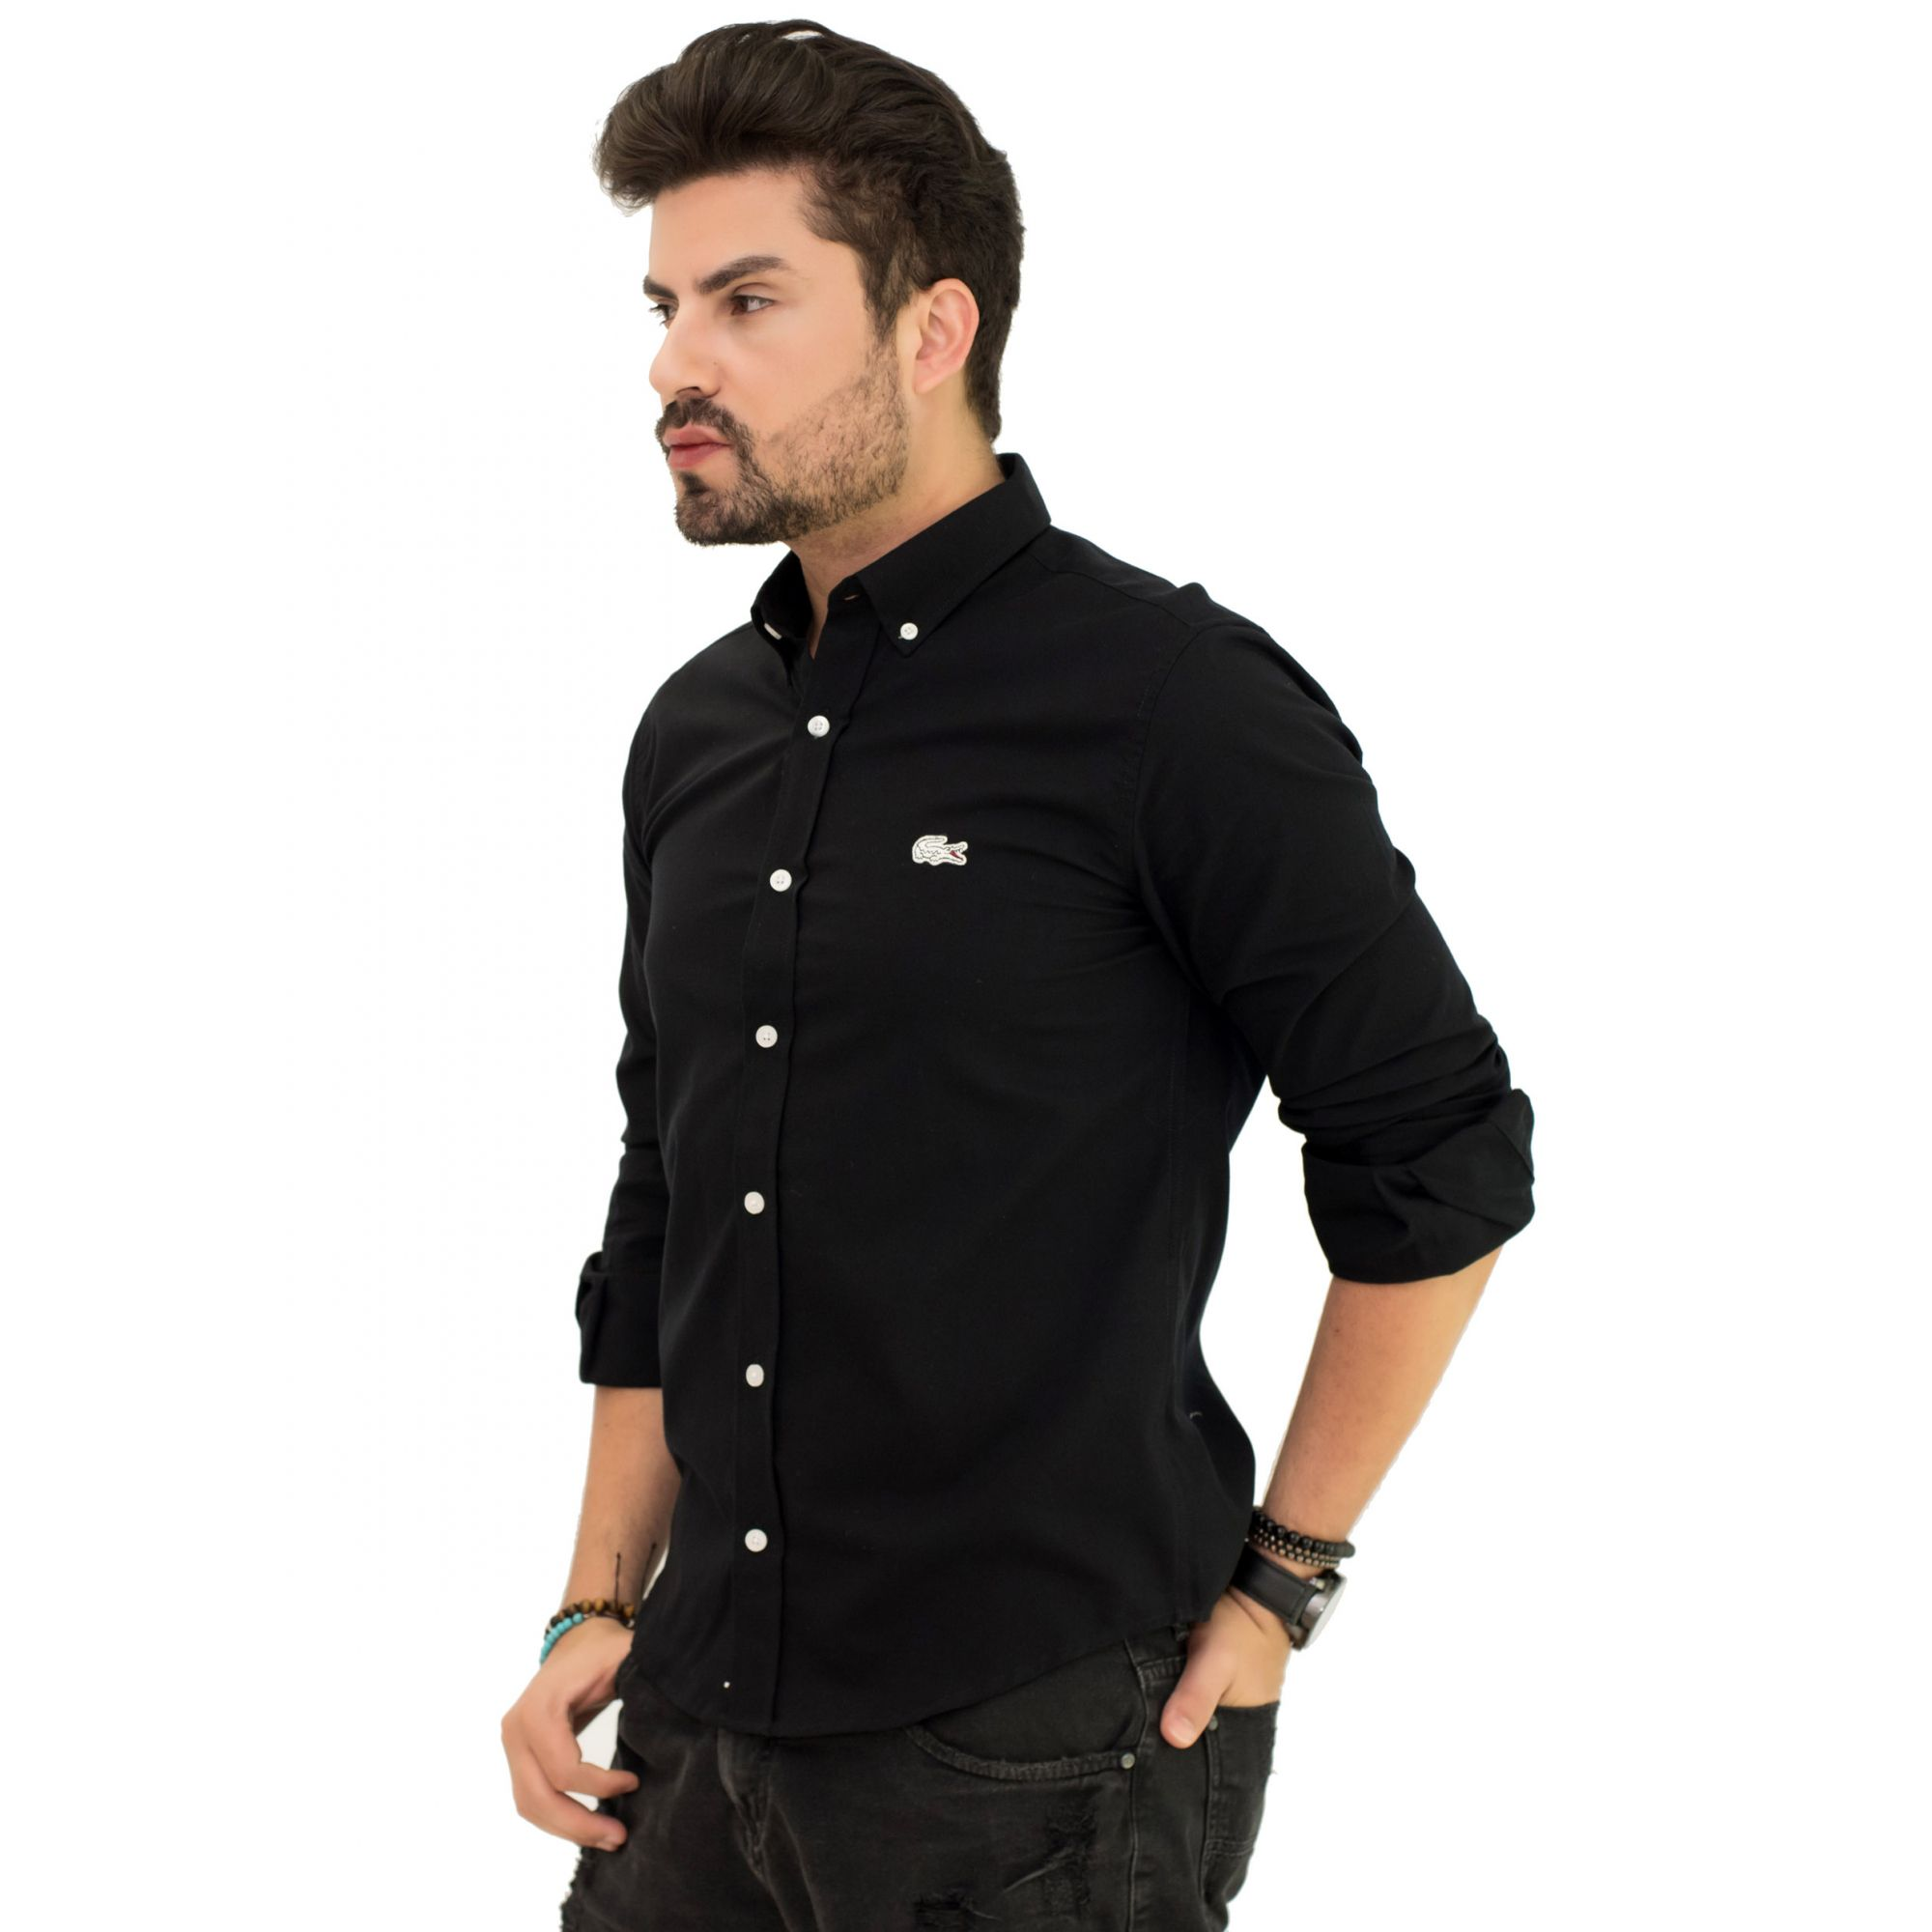 Camisa Social LCT Preta Oxford  - Ca Brasileira